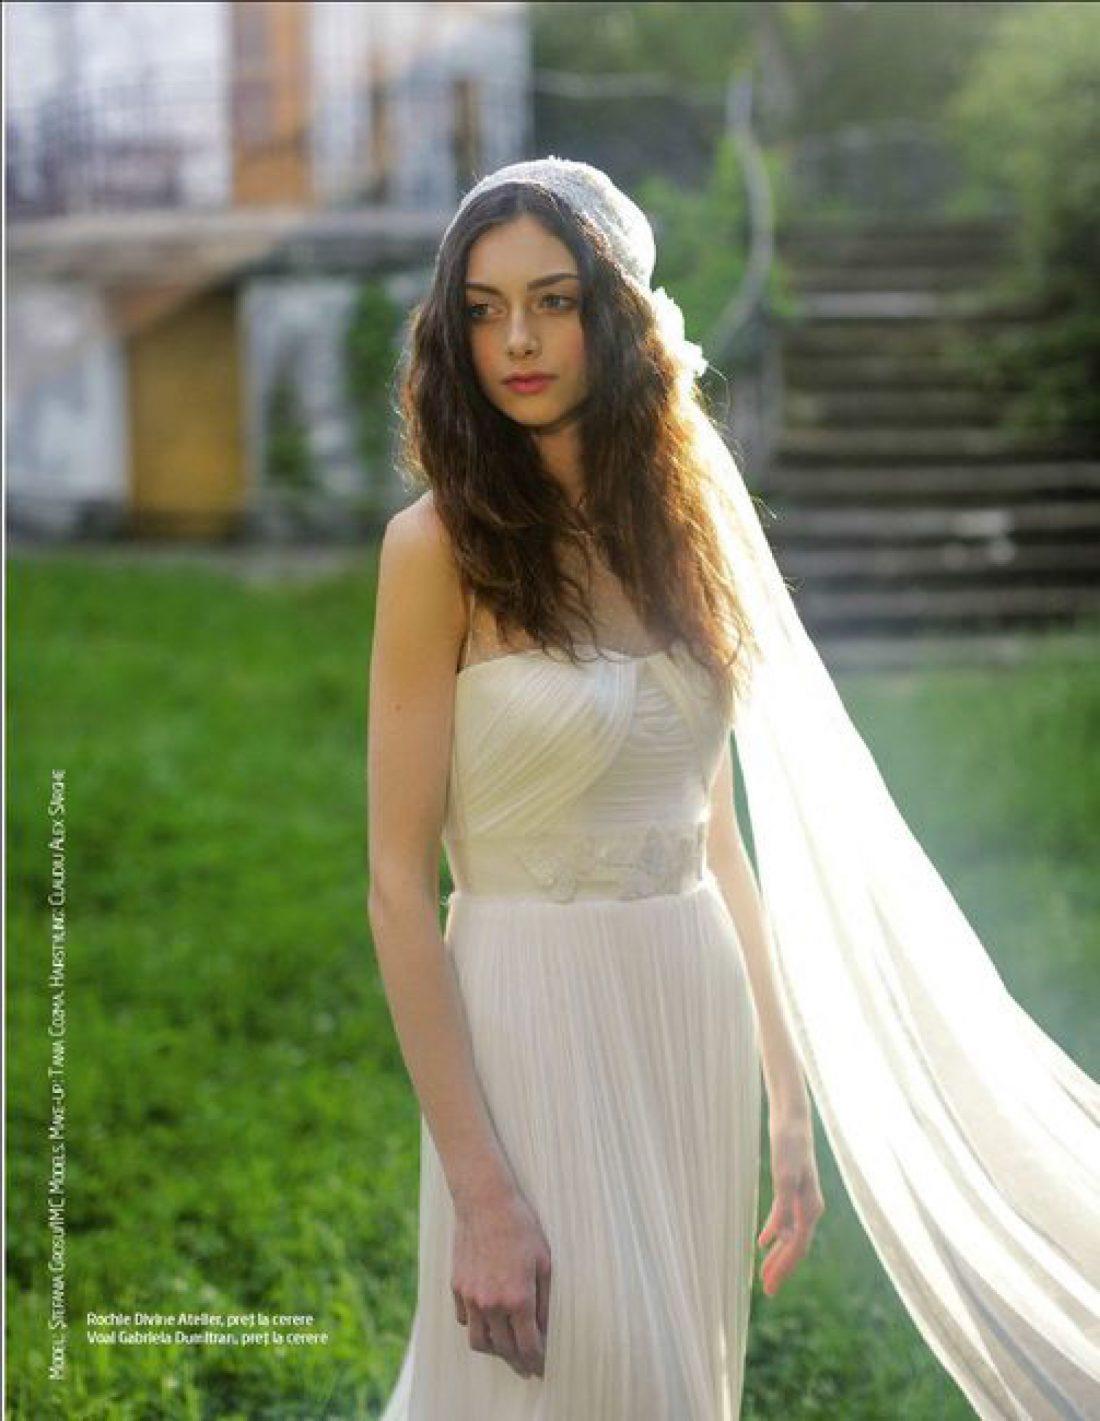 Days of heaven | Tania Cozma makeup